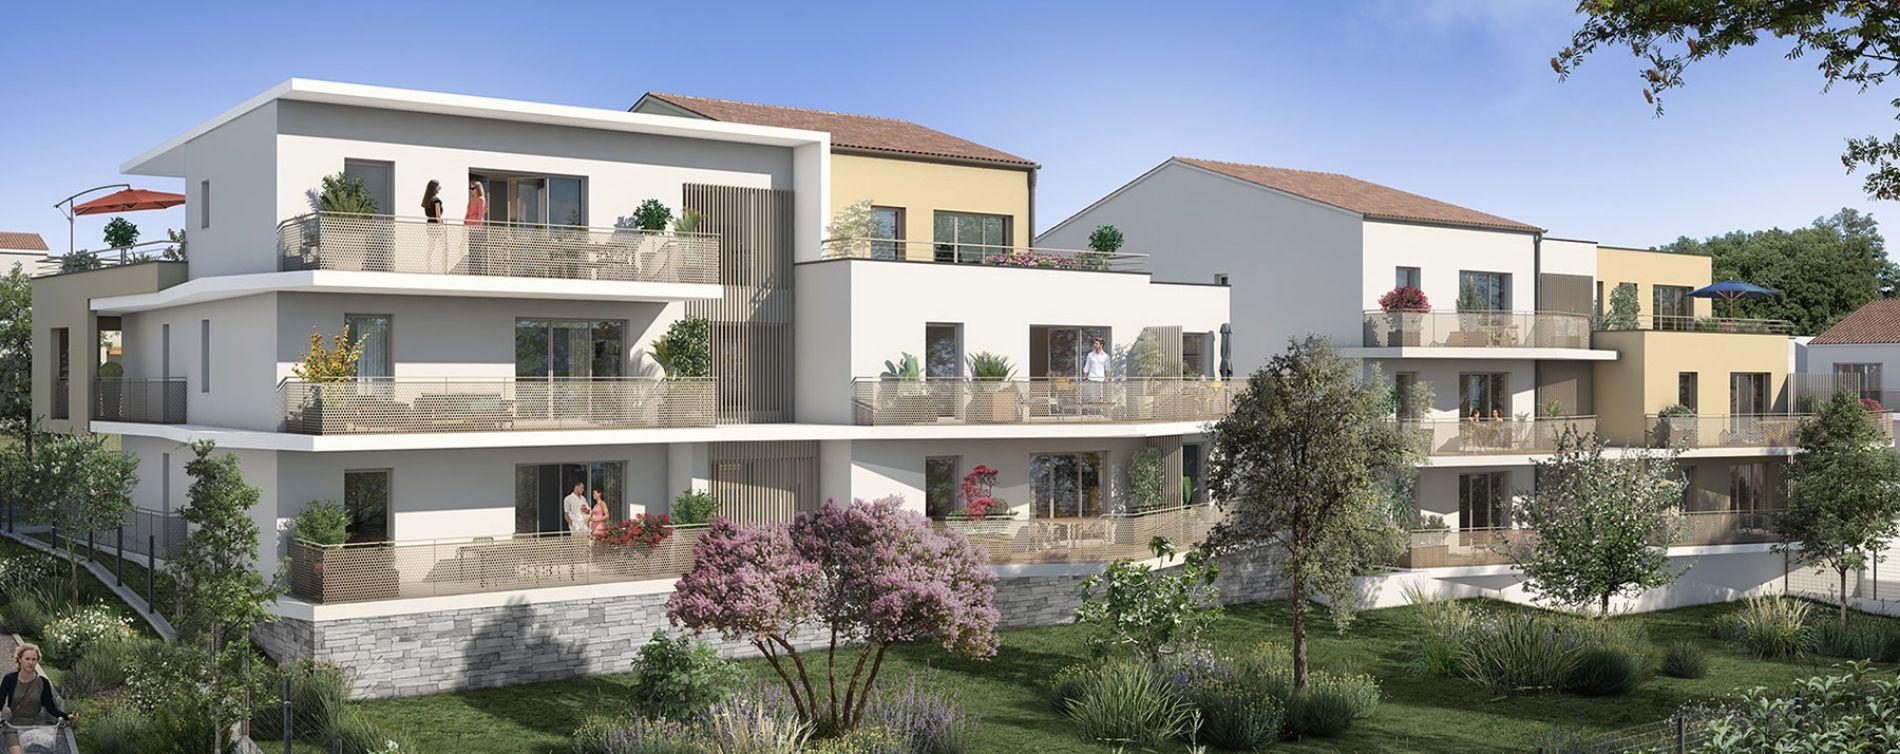 Meyreuil : programme immobilier neuve « Résidence Terra Verde » en Loi Pinel